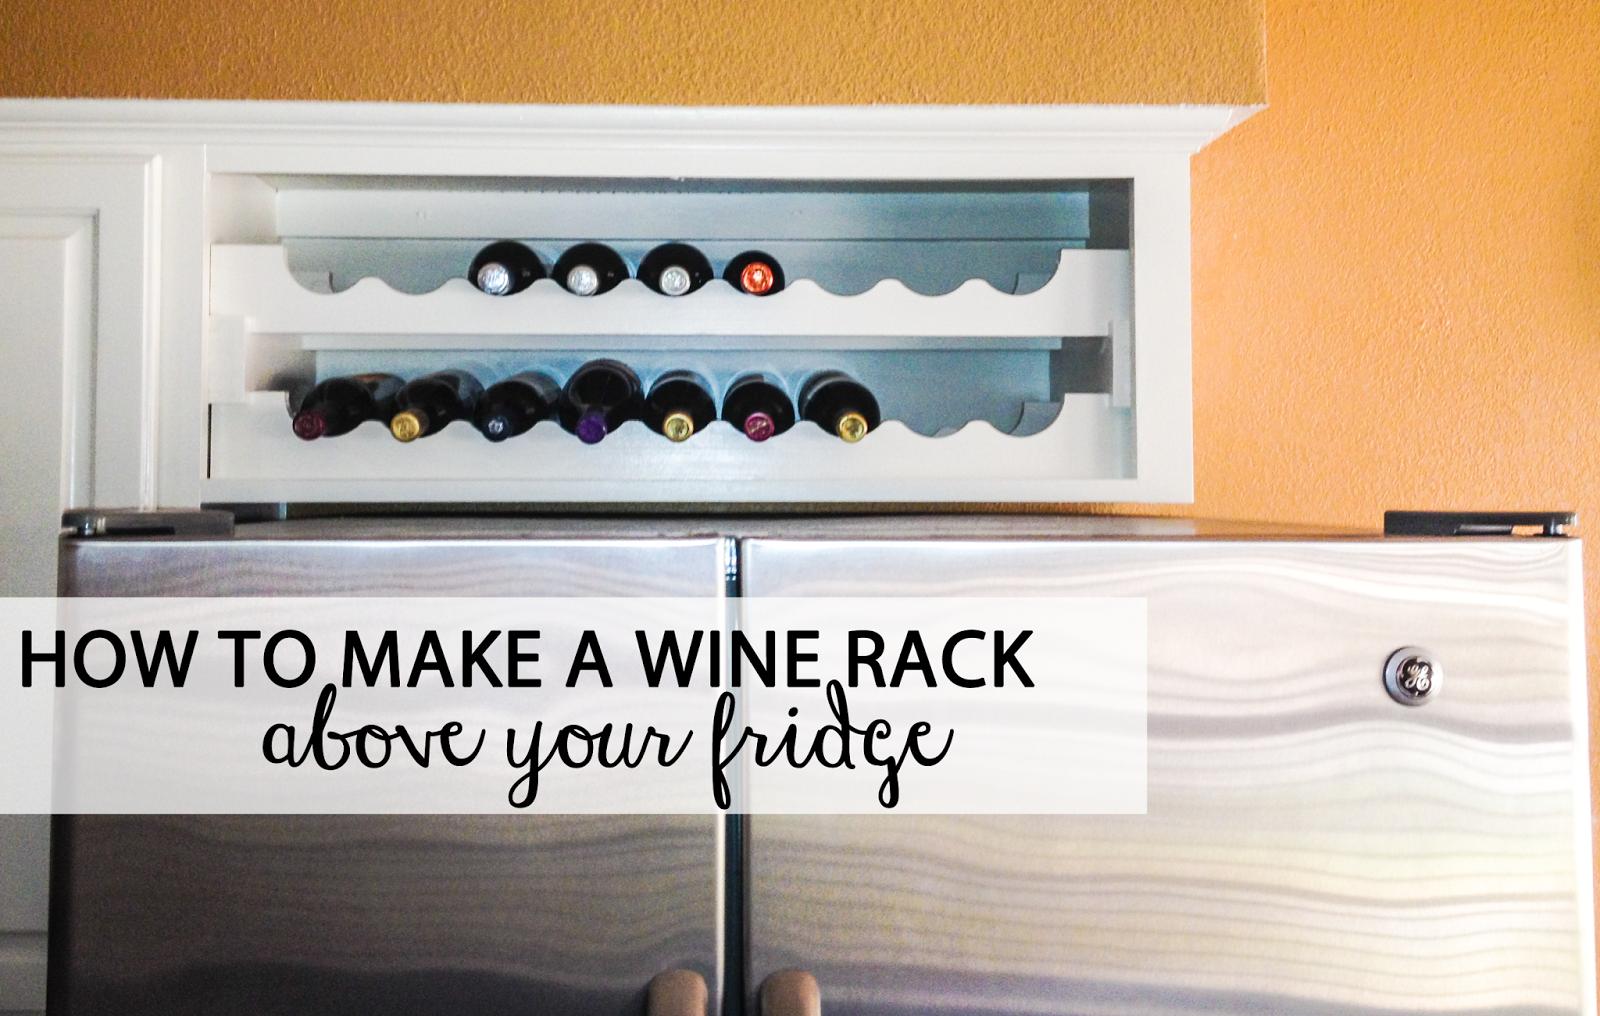 Building Wine Rack Above Fridge Free Download PDF Woodworking